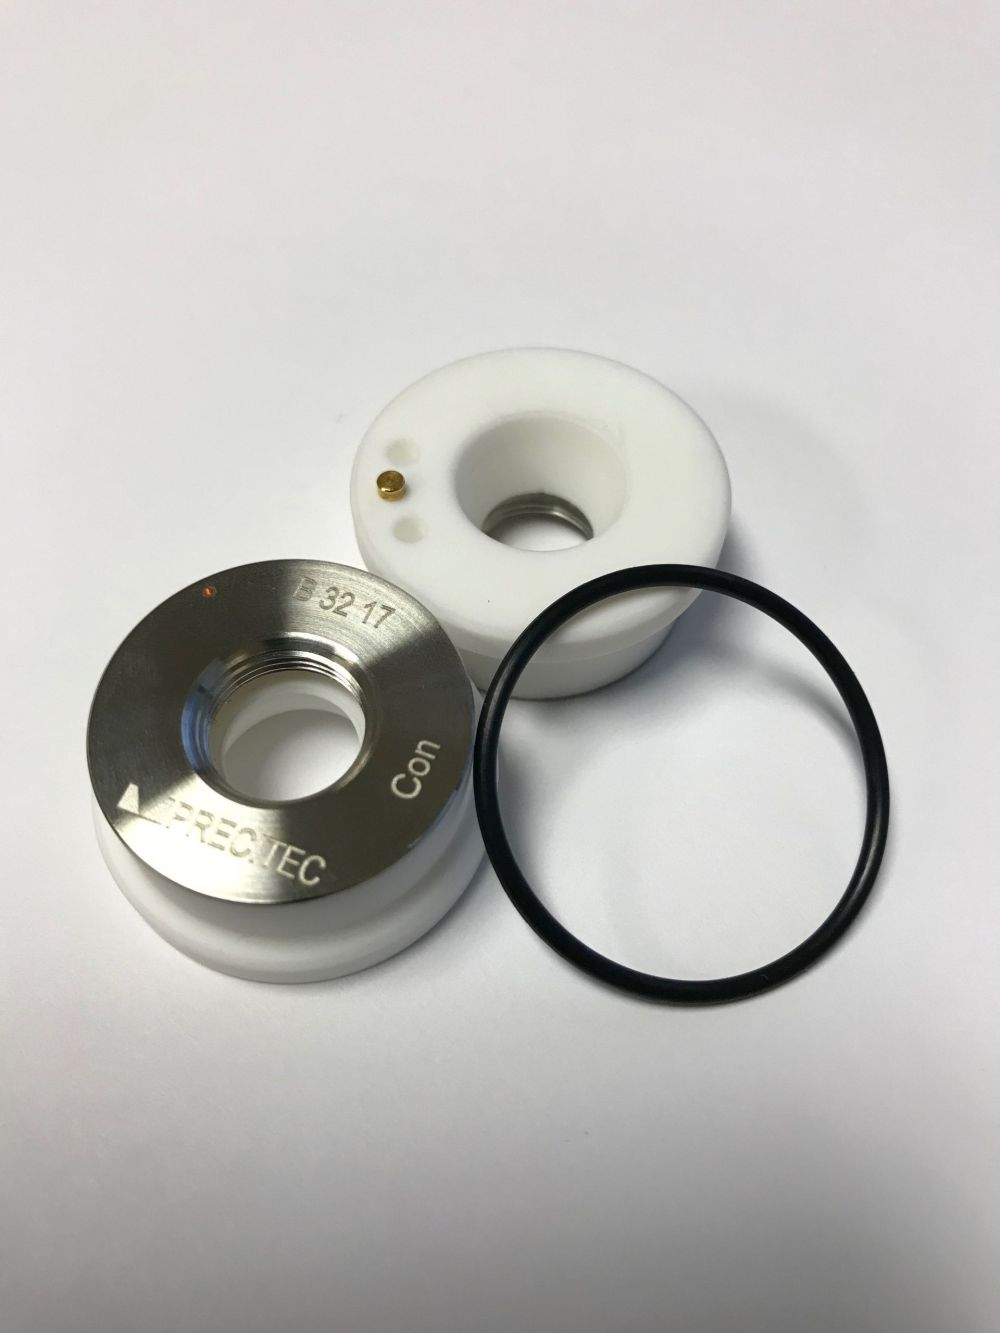 "Precitec Ceramic Nozzle Holder P0571-1051-00001 KT B2"" CON"